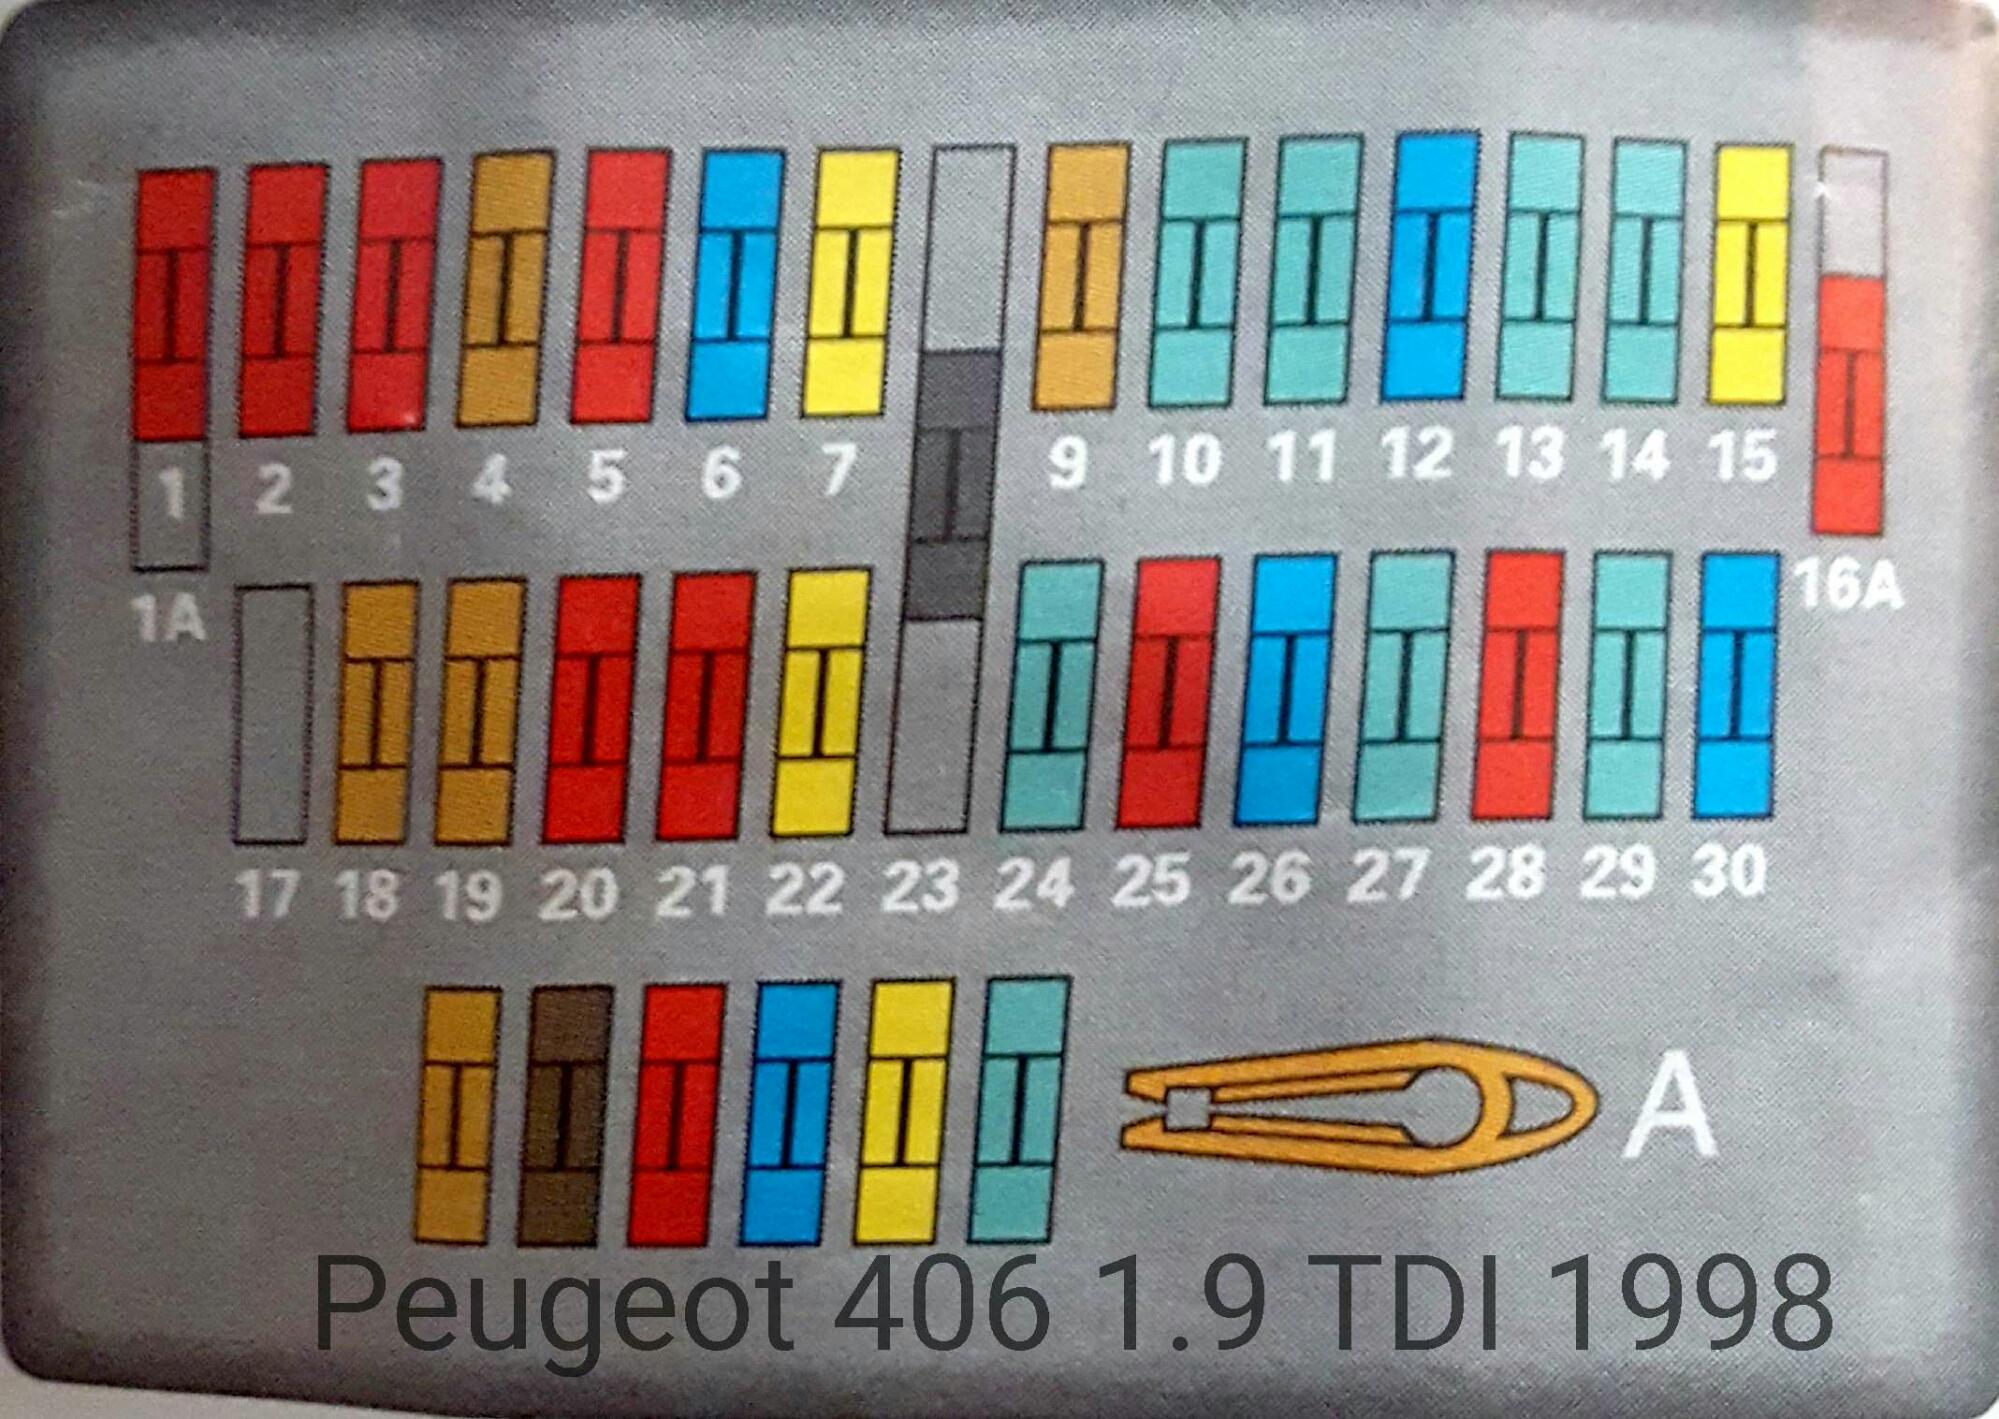 x reg peugeot 206 fuse box diagram [ 1999 x 1419 Pixel ]